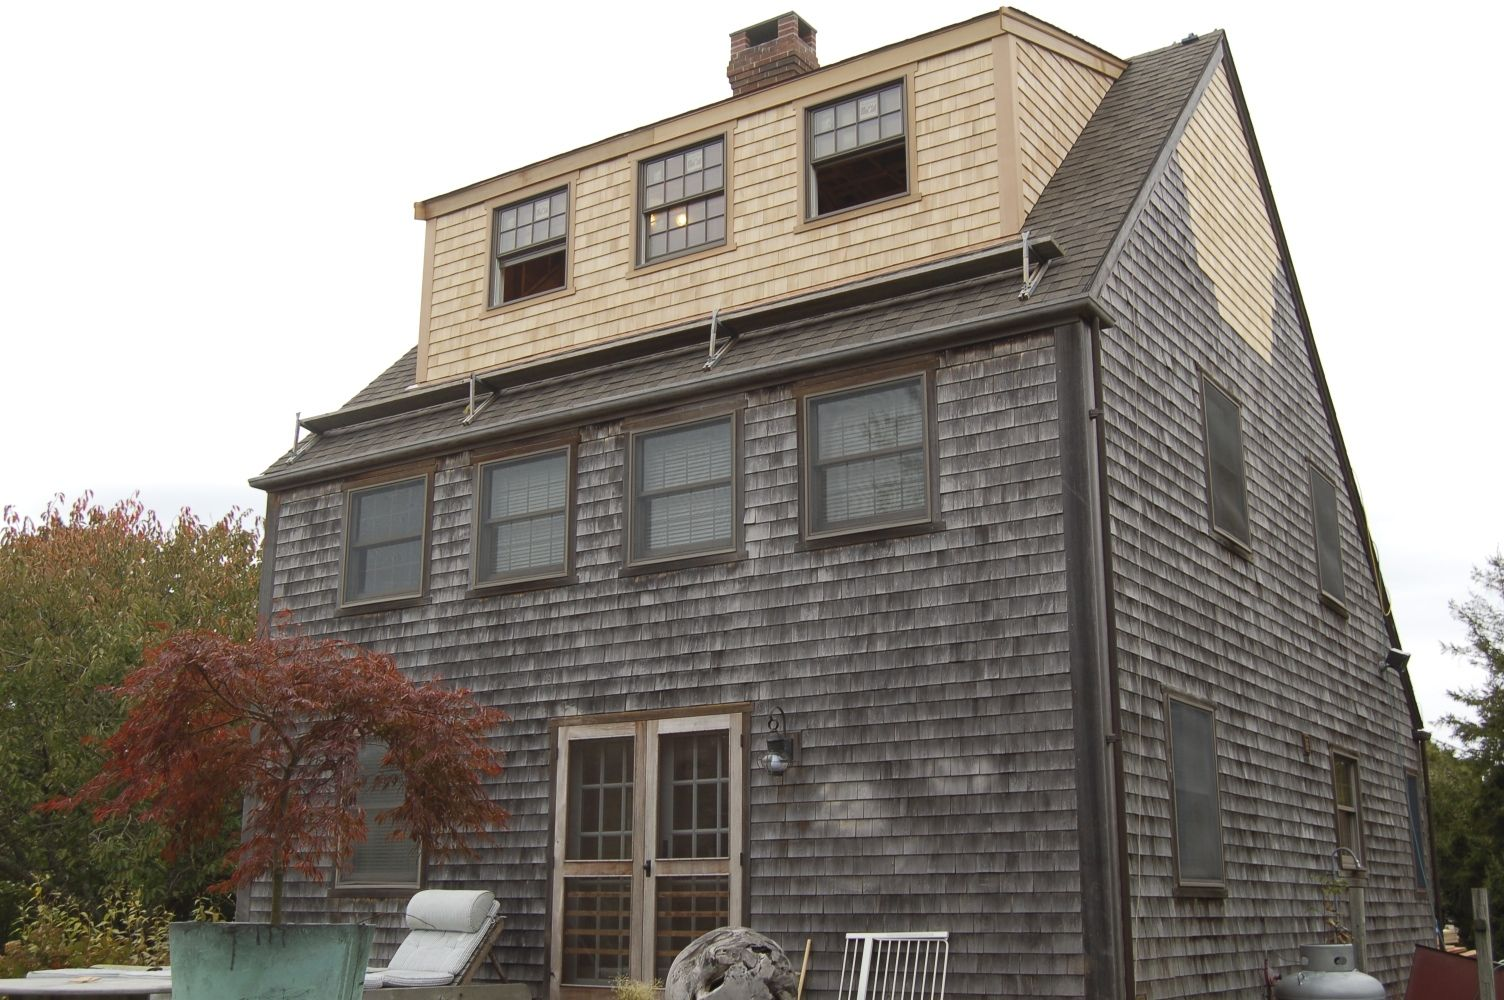 Building a dormer on a house - Third Floor Shed Dormer